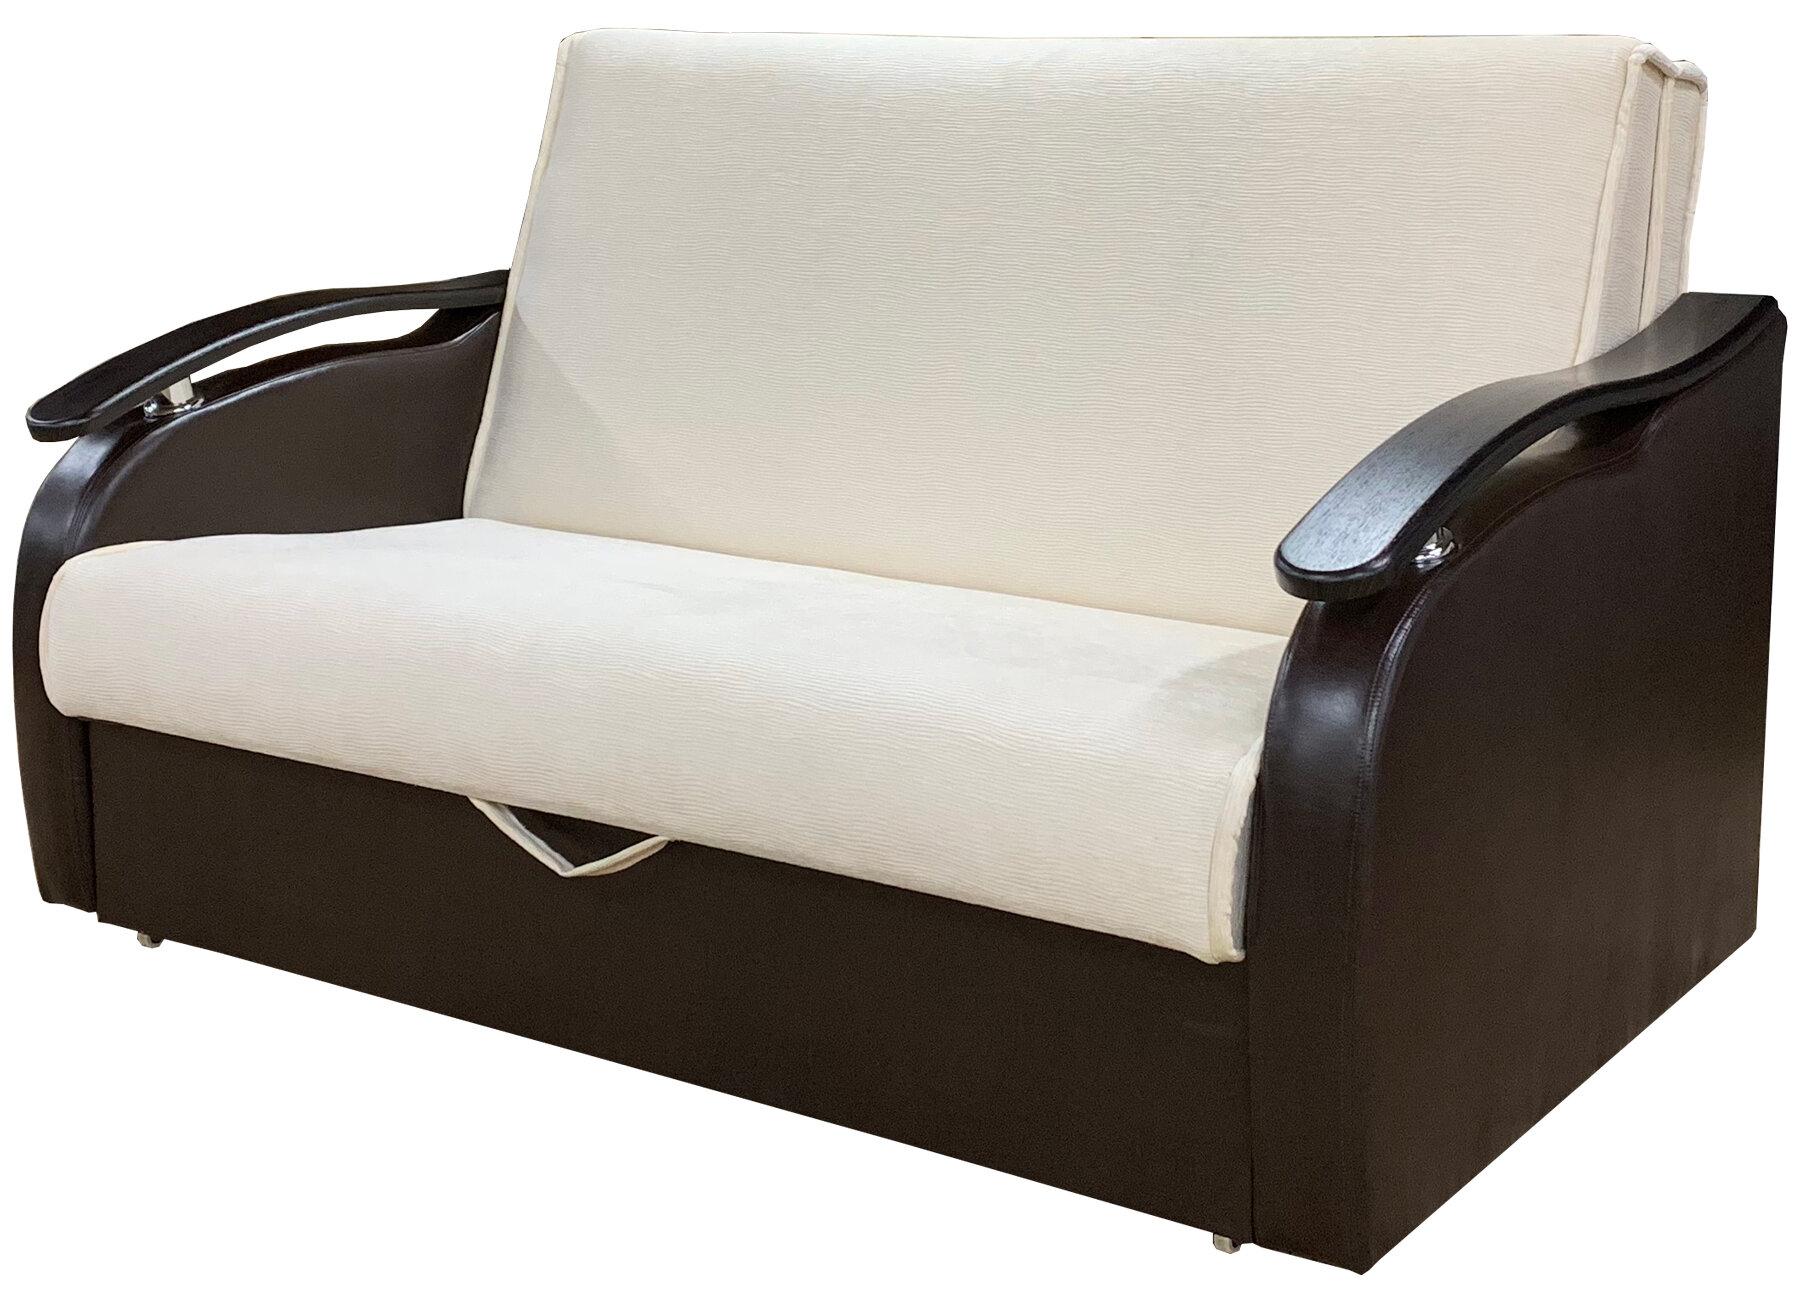 Диван Мебель-Сервис фото 1